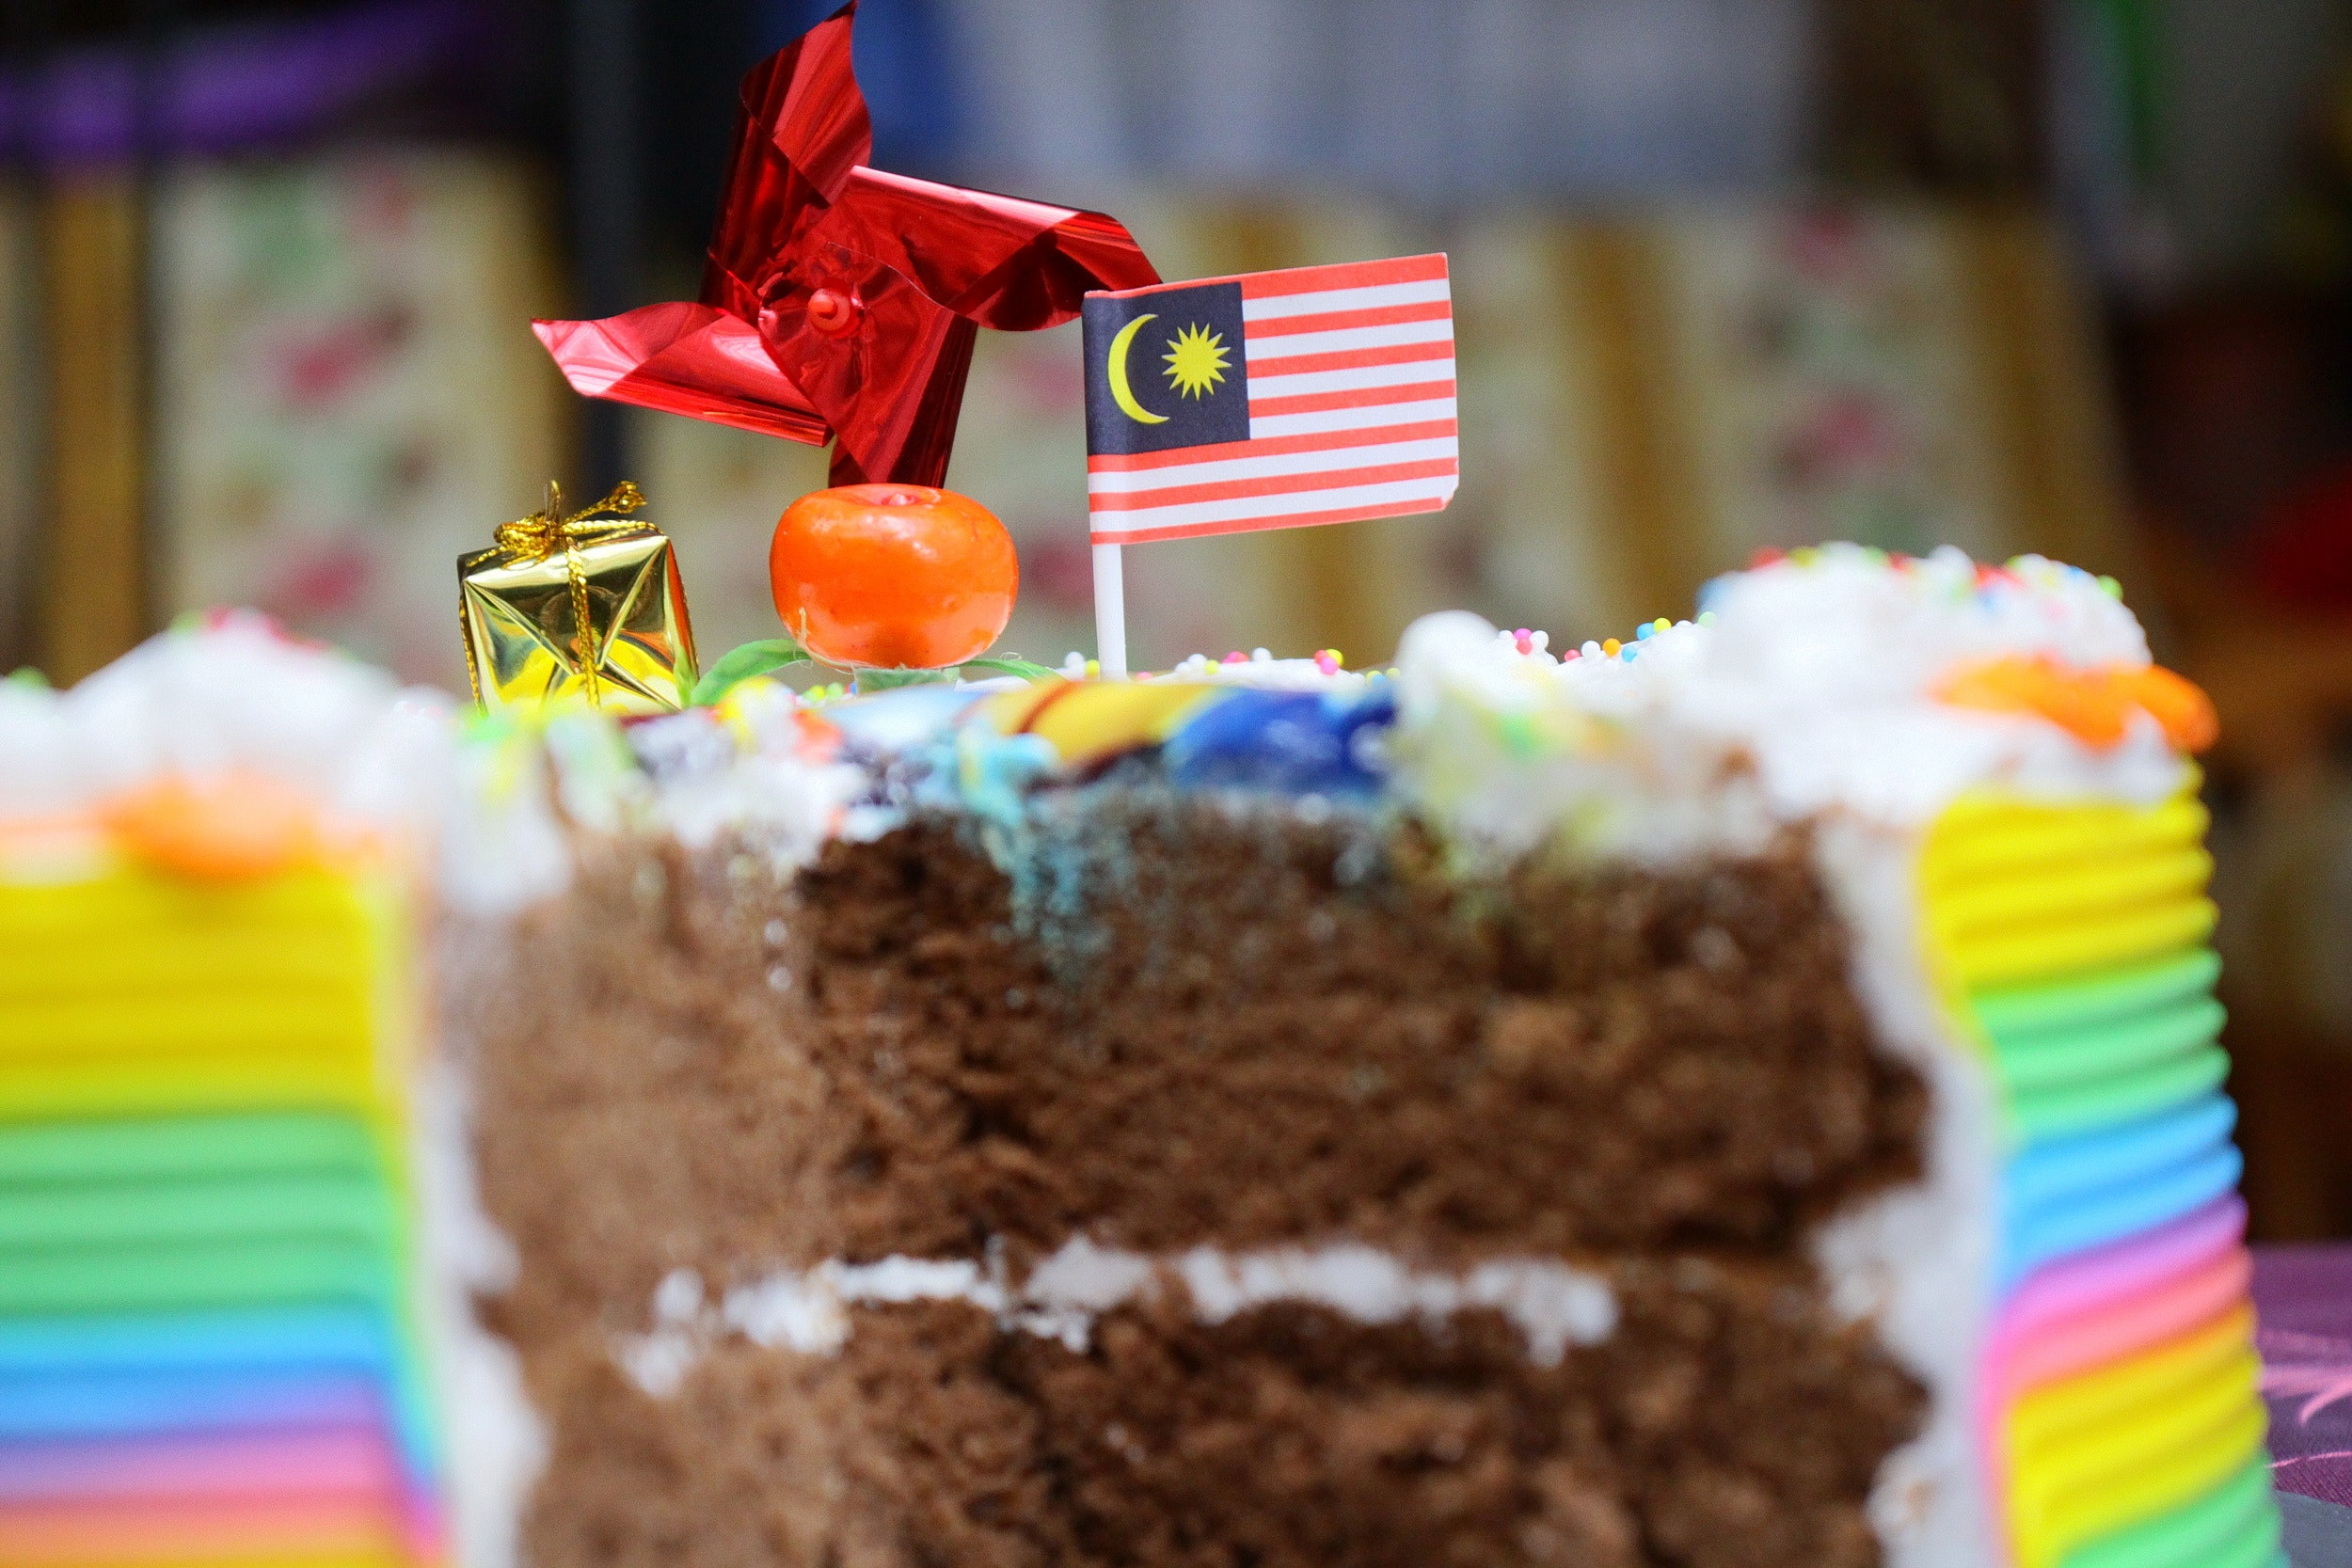 Close-up of birthday cake photo